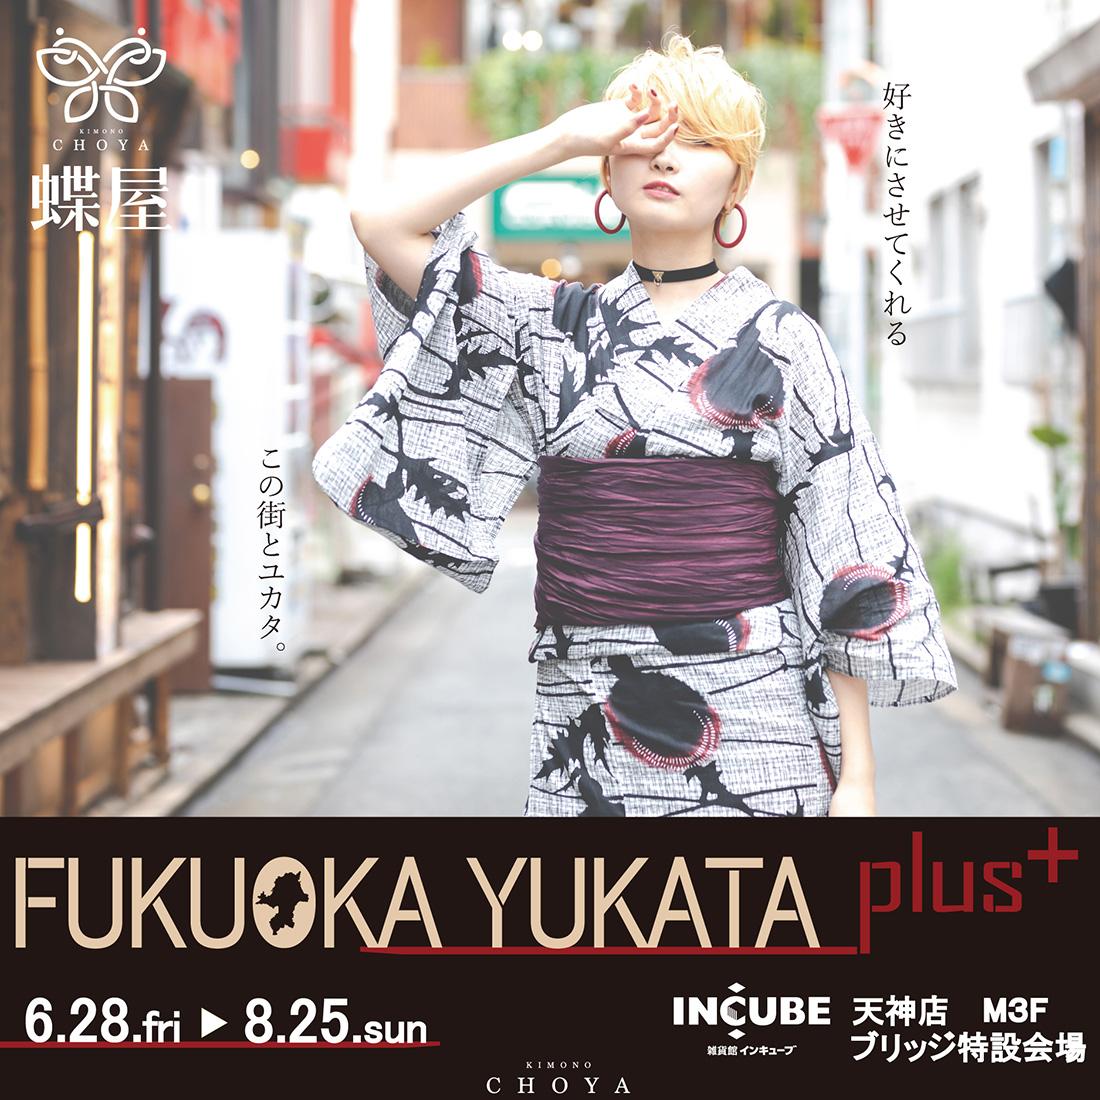 611860fa73e 2019年6月28日(金)より、インキューブ天神にて今年で18年目の浴衣POP UP SHOP「FUKUOKA YUKATA plus+」を開催。